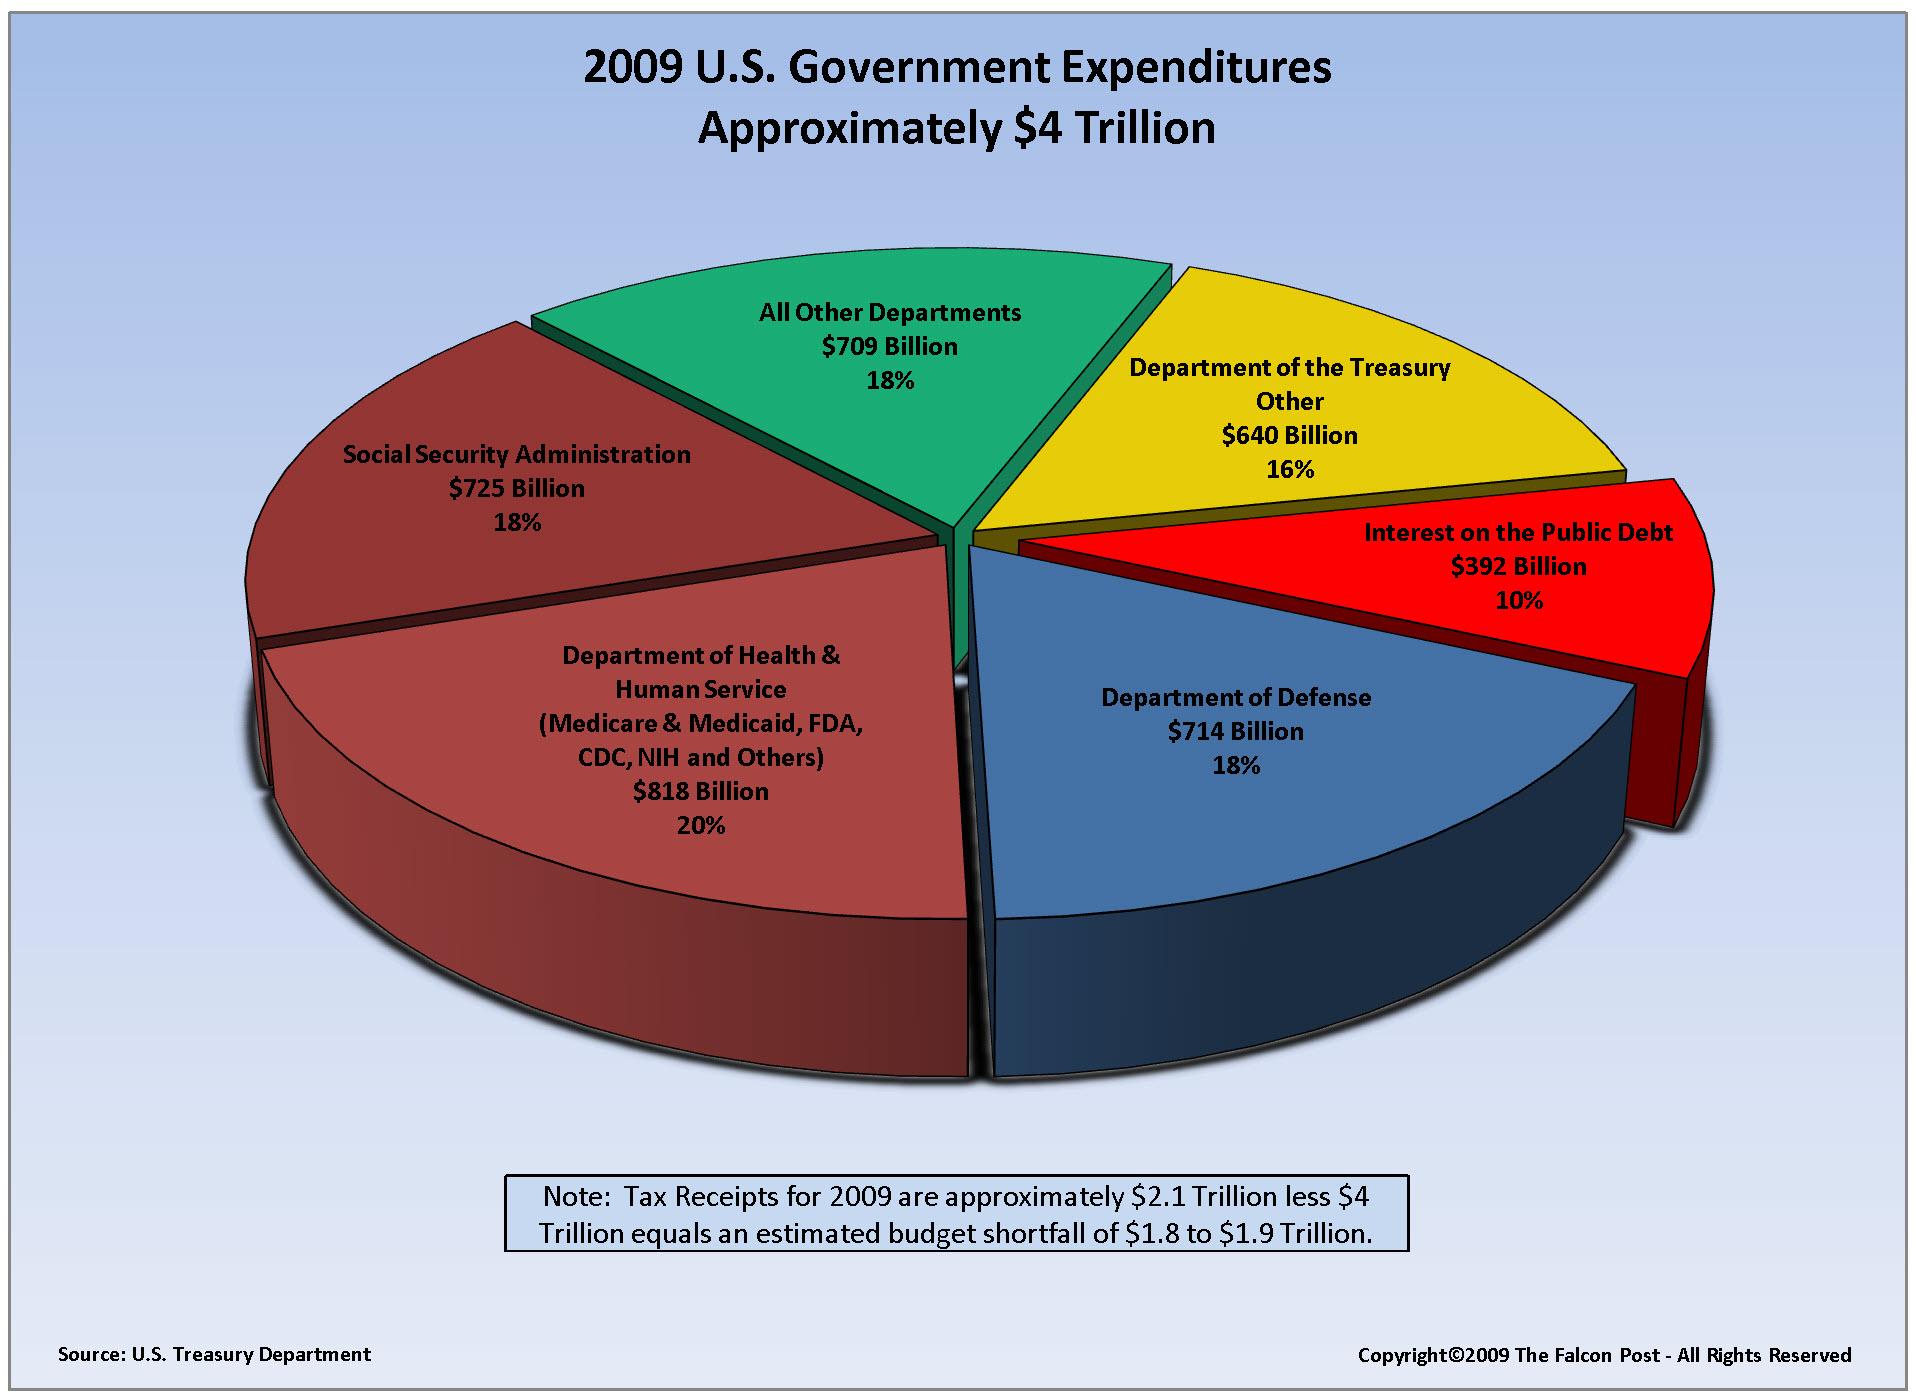 Govt spending pie chart choice image free any chart examples government spending pie chart 2012 budget pie commonpence co budget pie commonpence co nvjuhfo choice image nvjuhfo Gallery